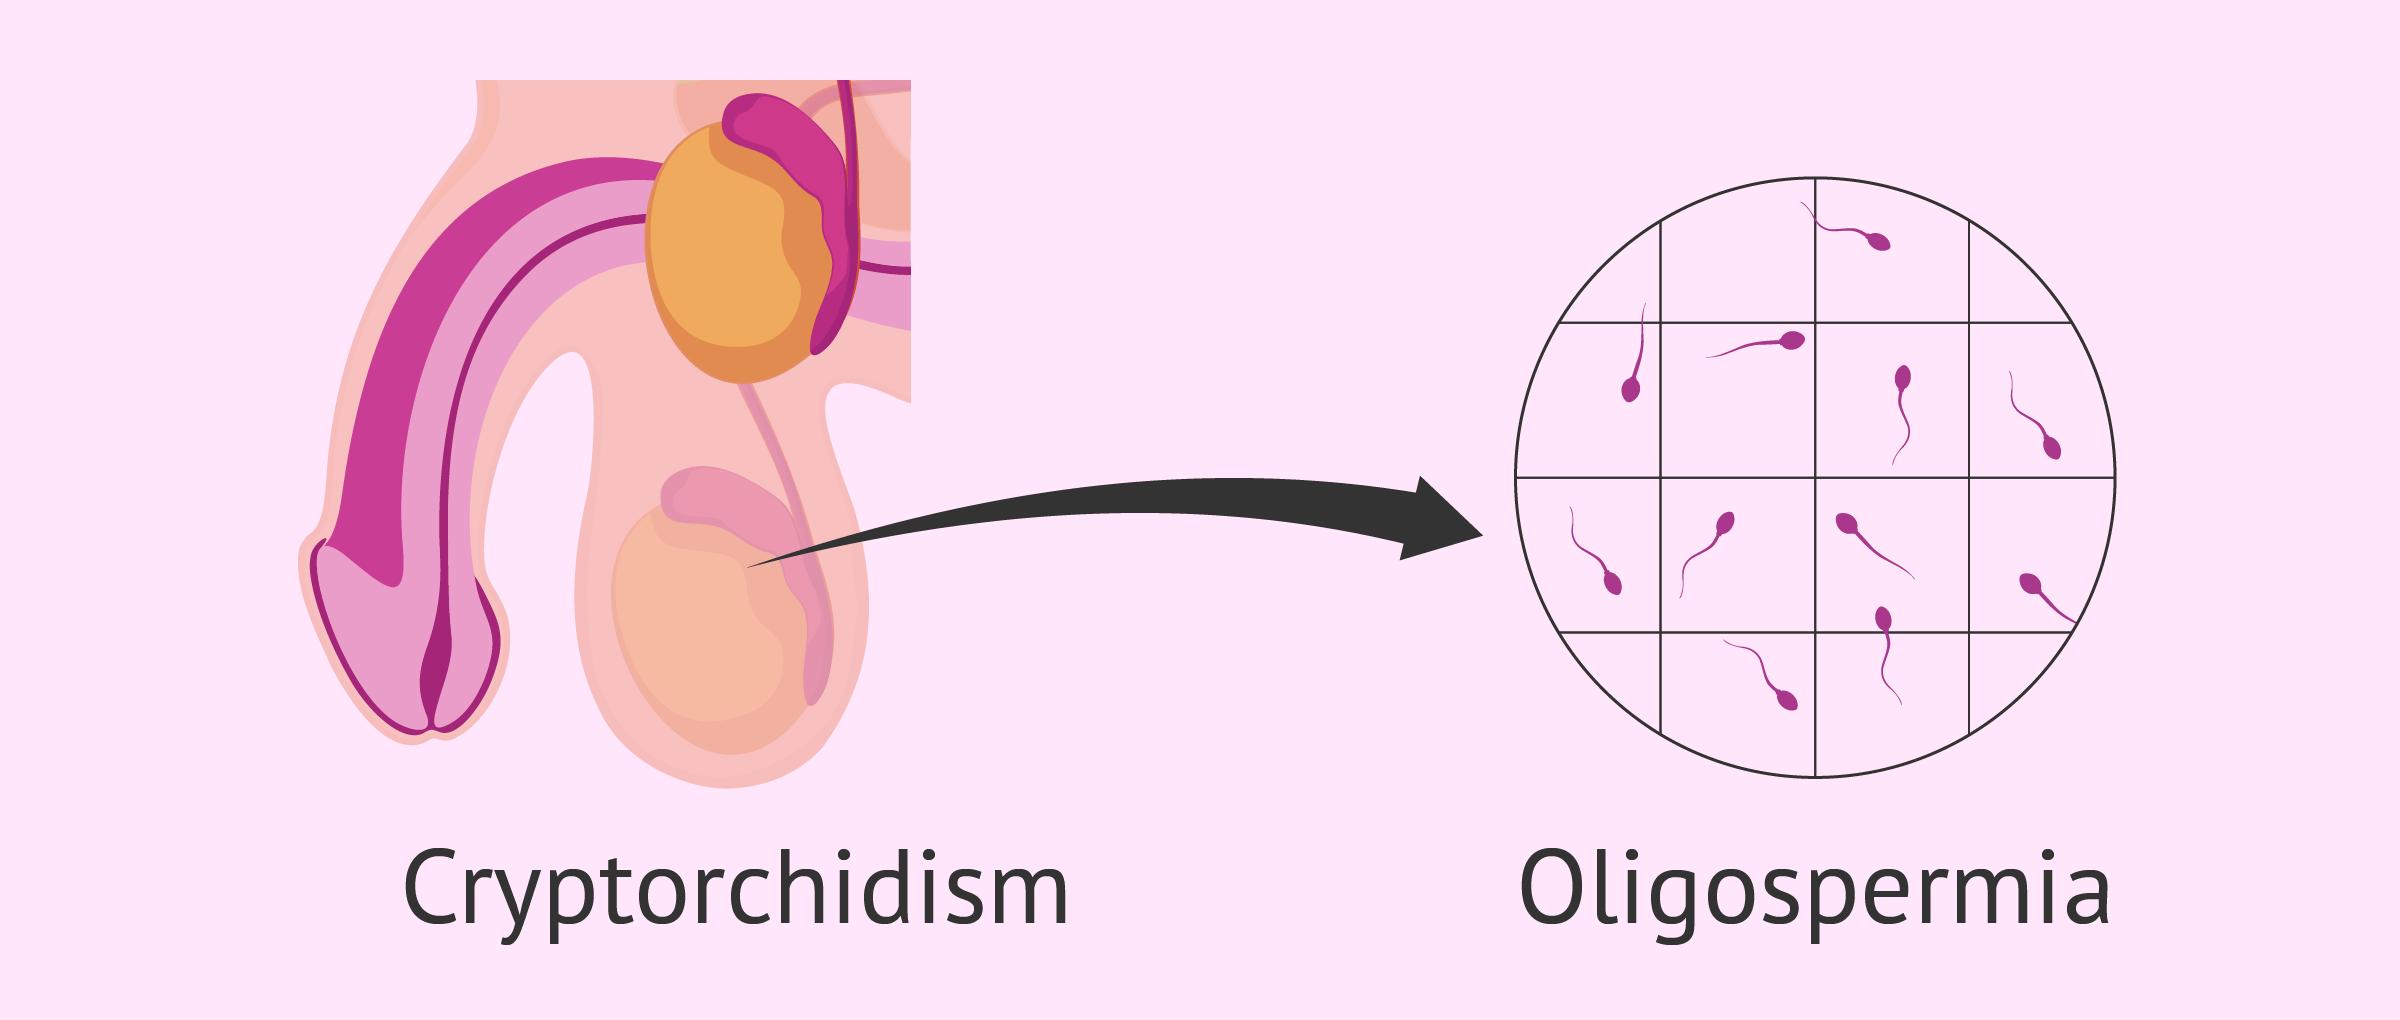 Cryptorchidism and oligospermia